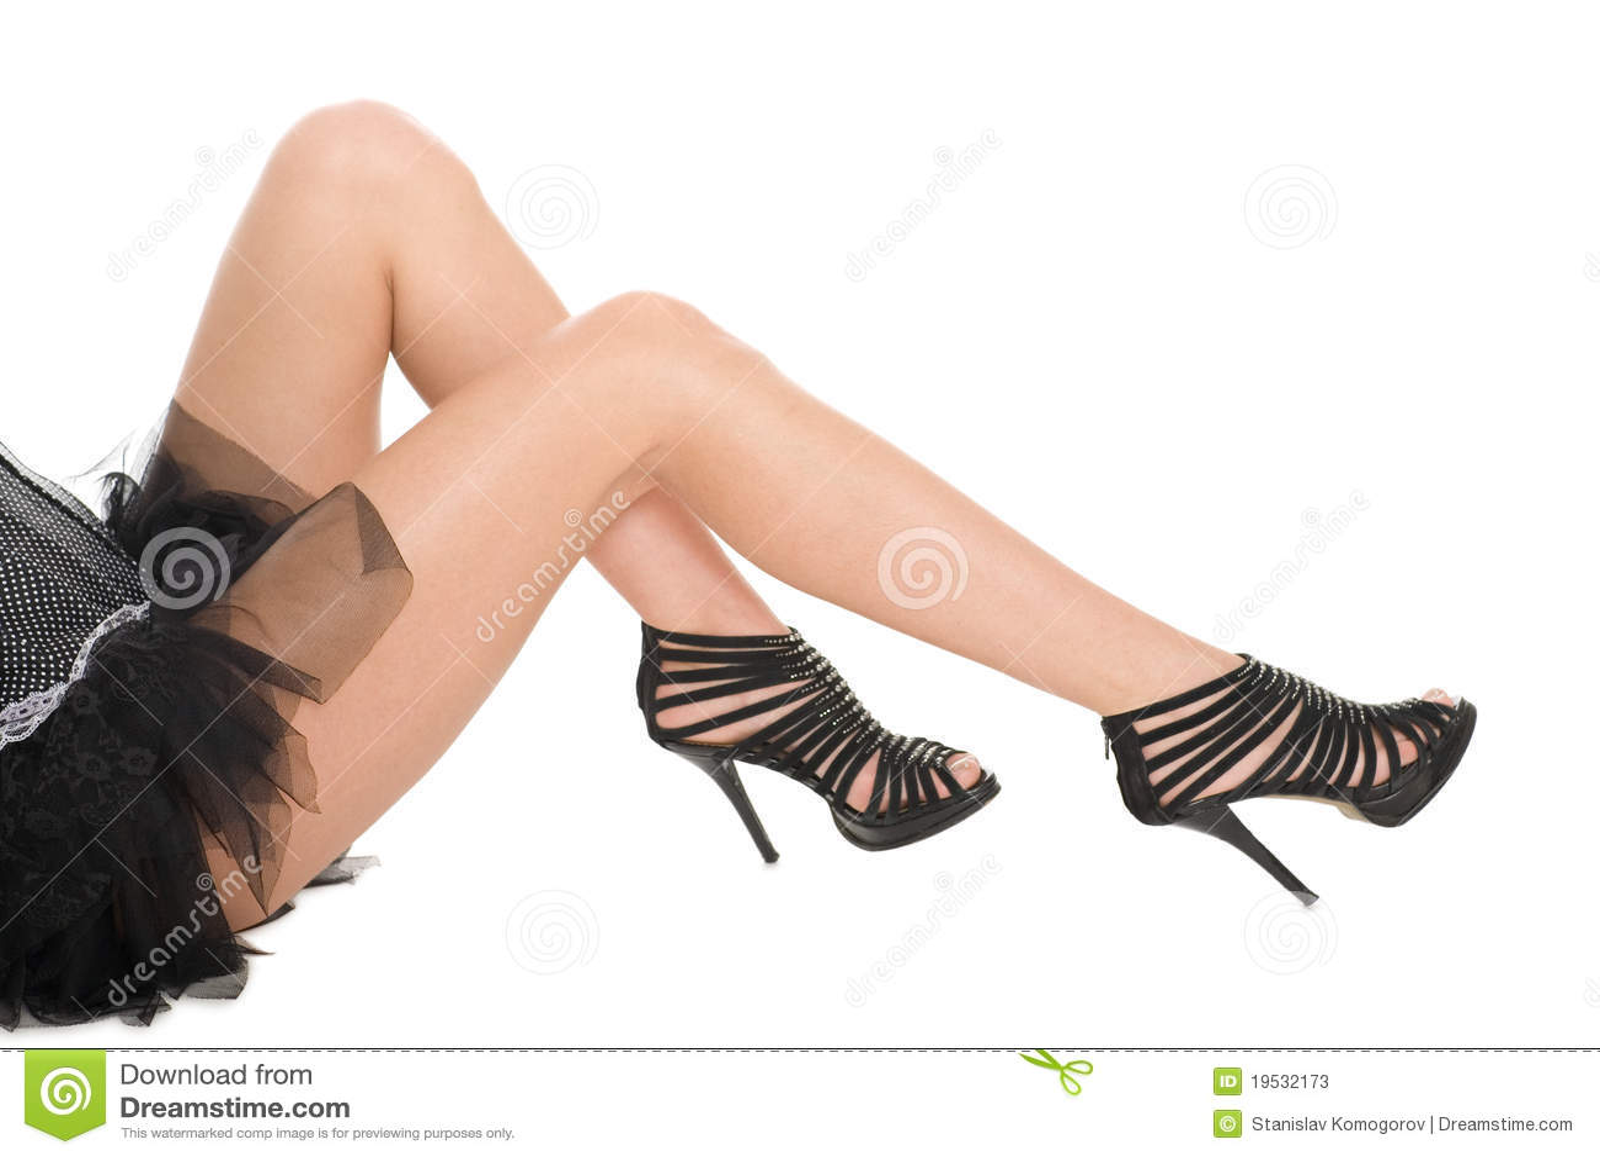 8d07da83840d49 Shapely legs a girl in sandals high heeled stock image jpg 1300x957 Shapely tanned  legs